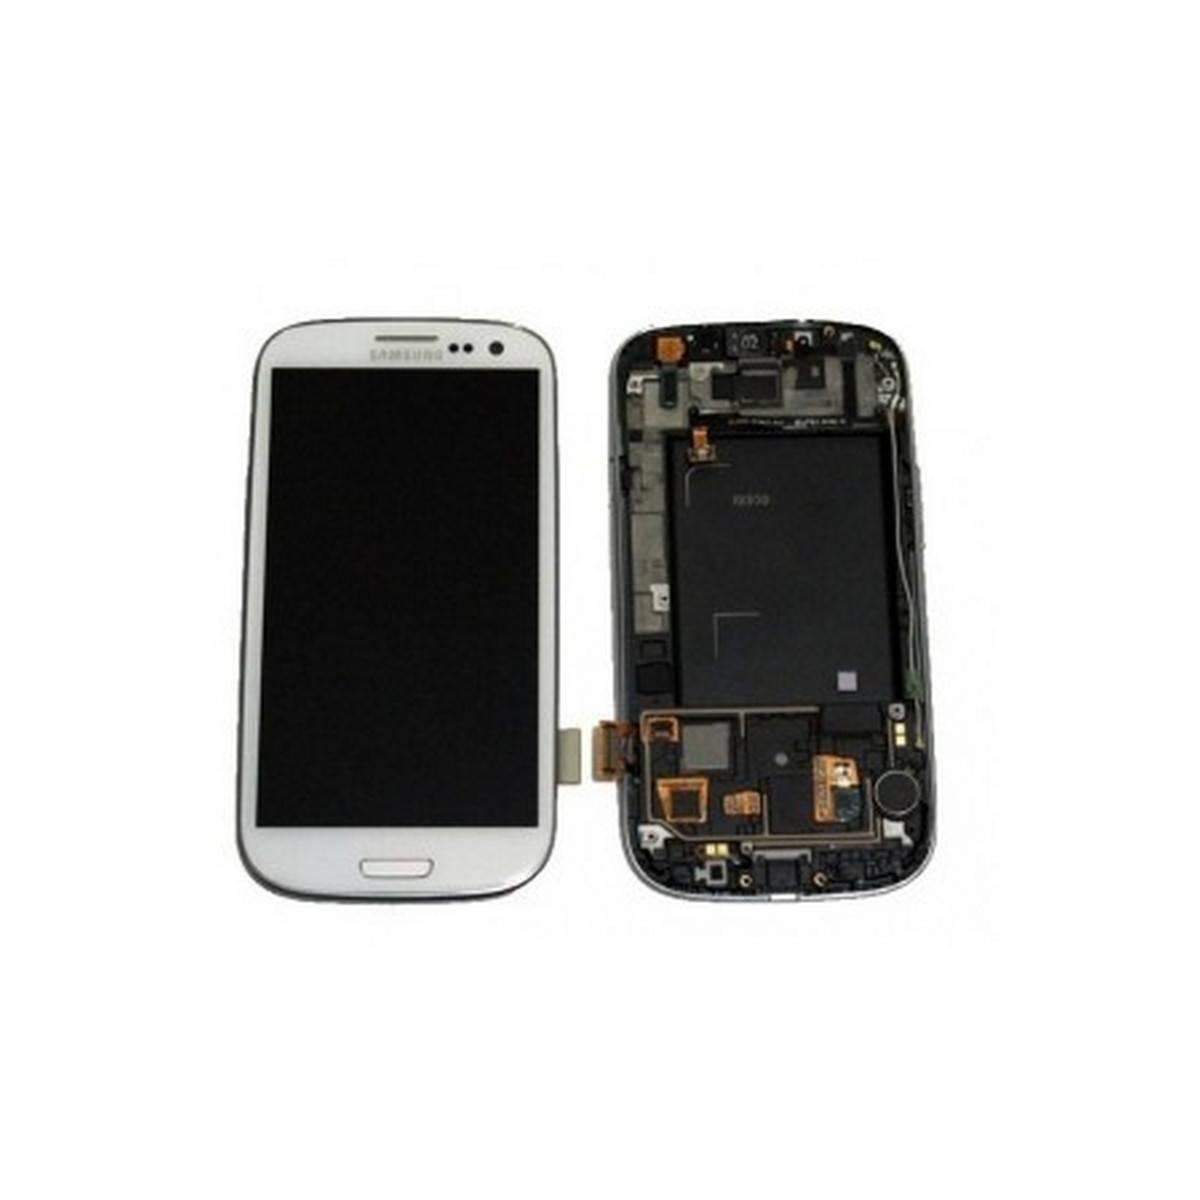 Ecrã completa + carcaça frontal Samsung Galaxy S3 i9300. BLANCA ORIGINAL